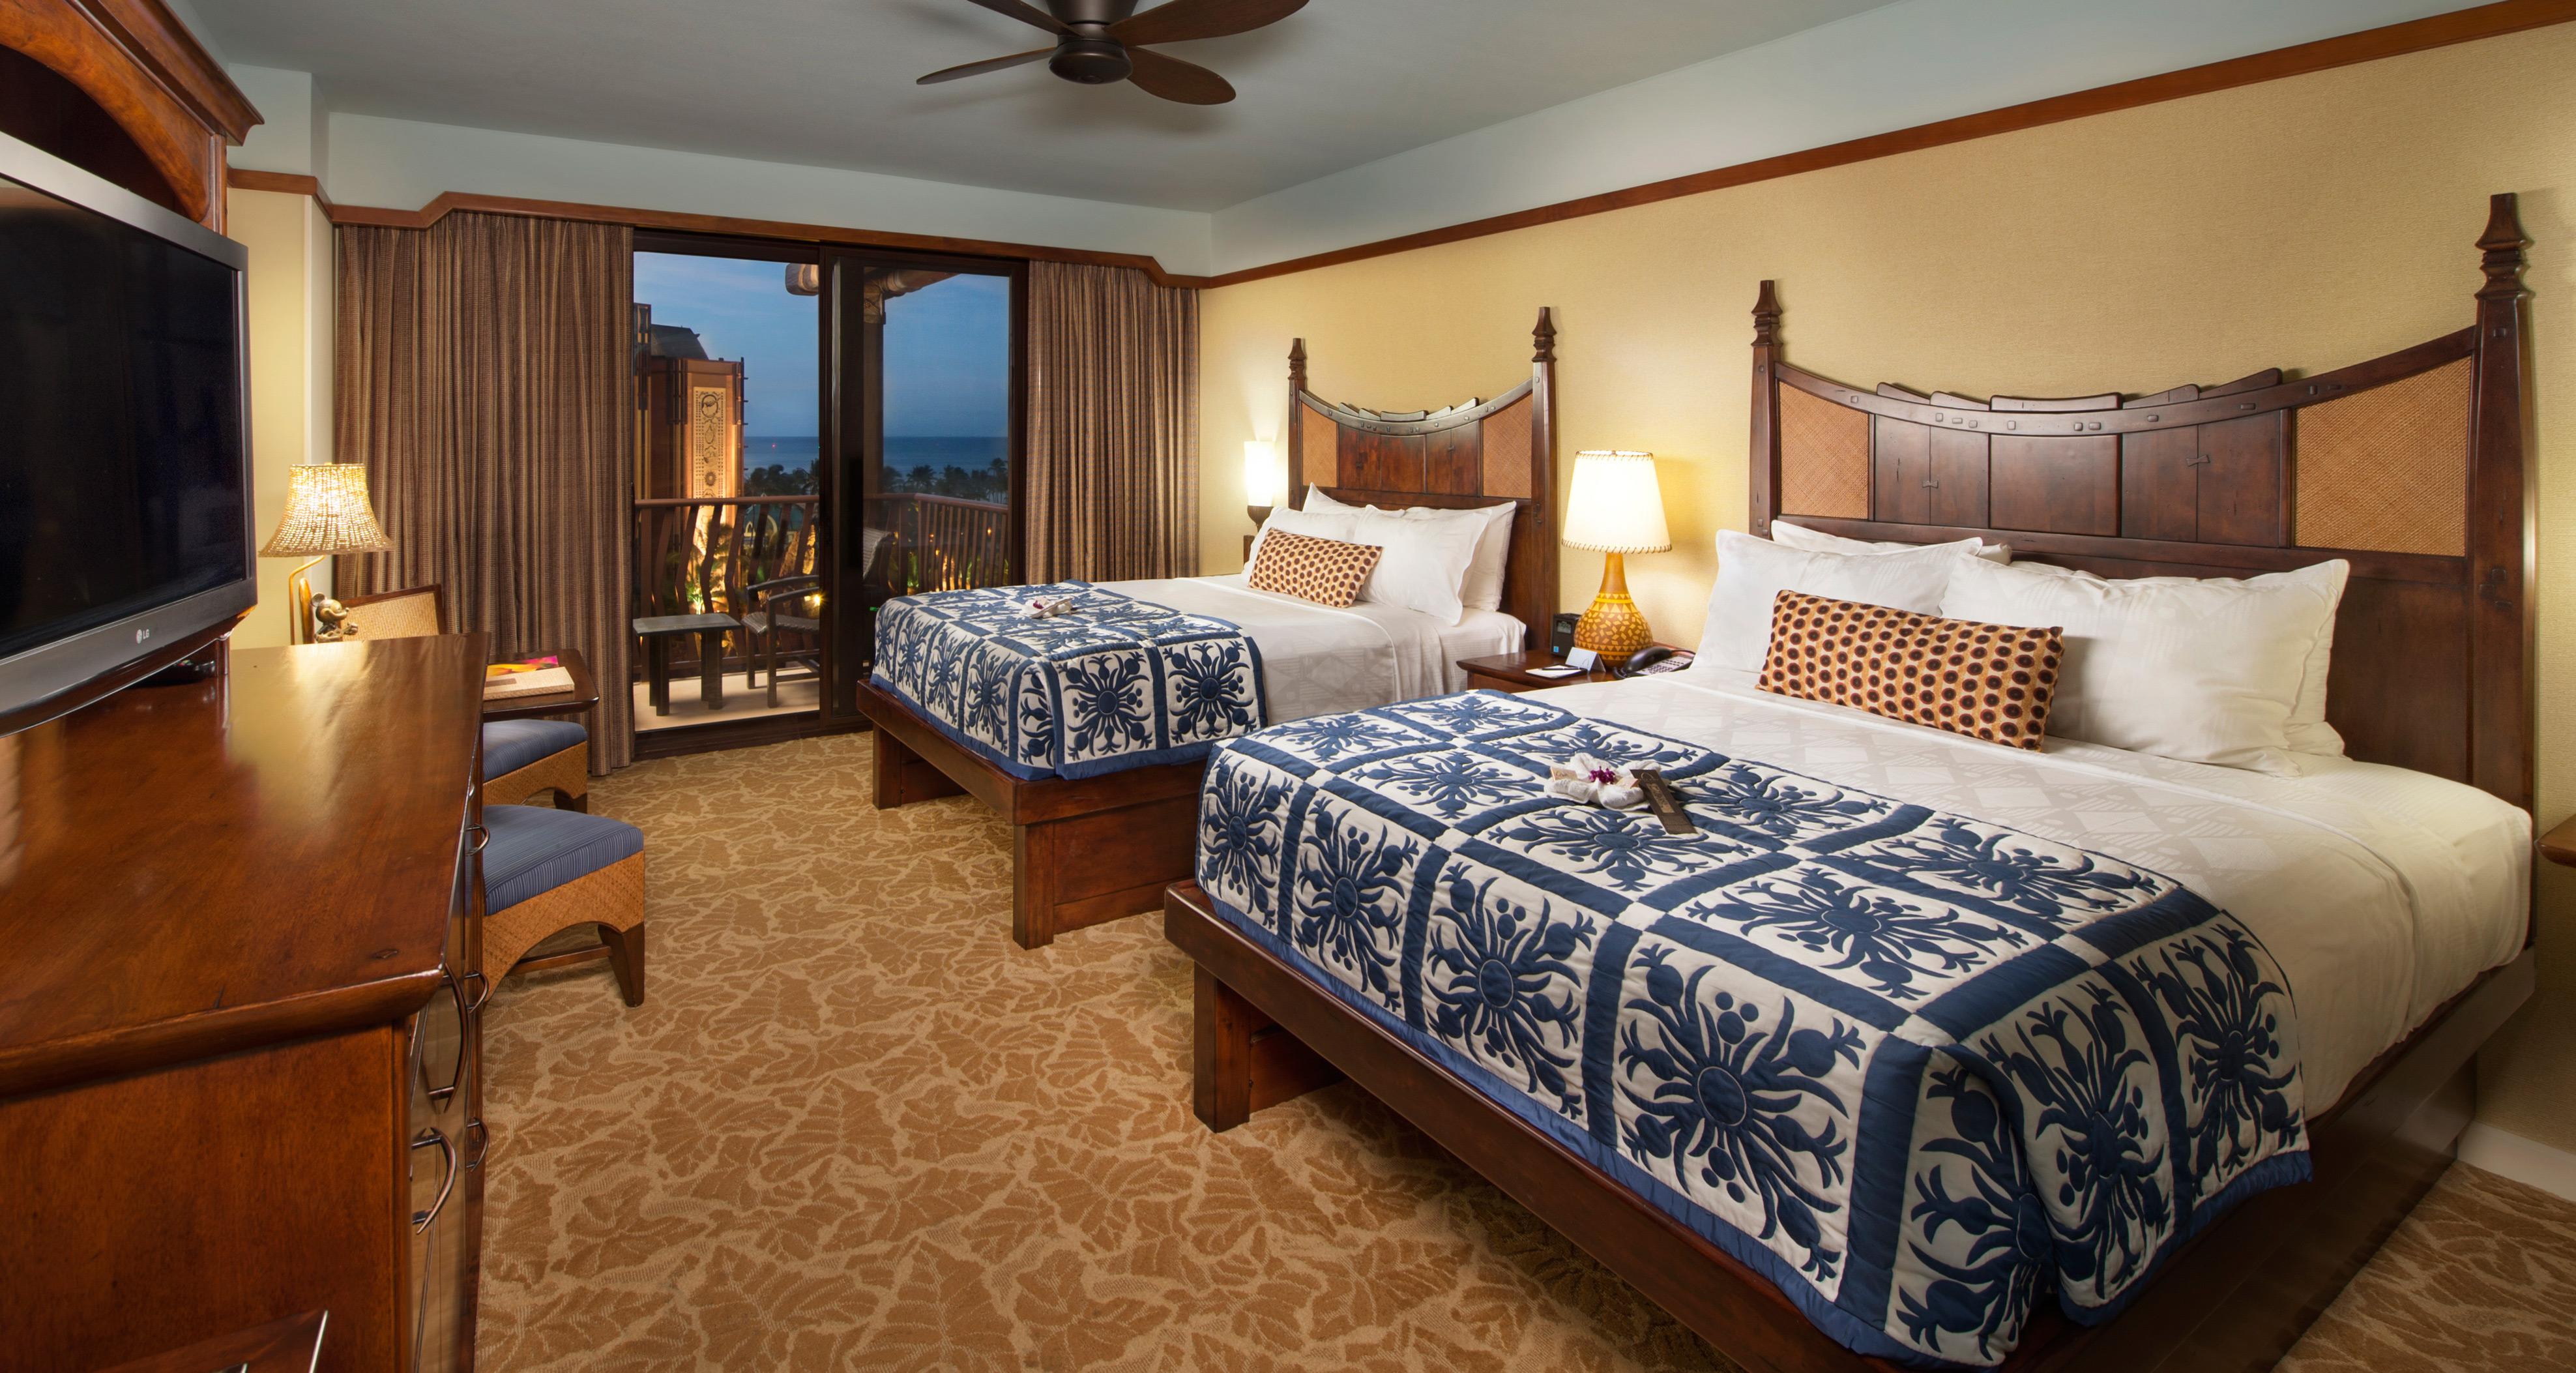 Standard Hotel Rooms